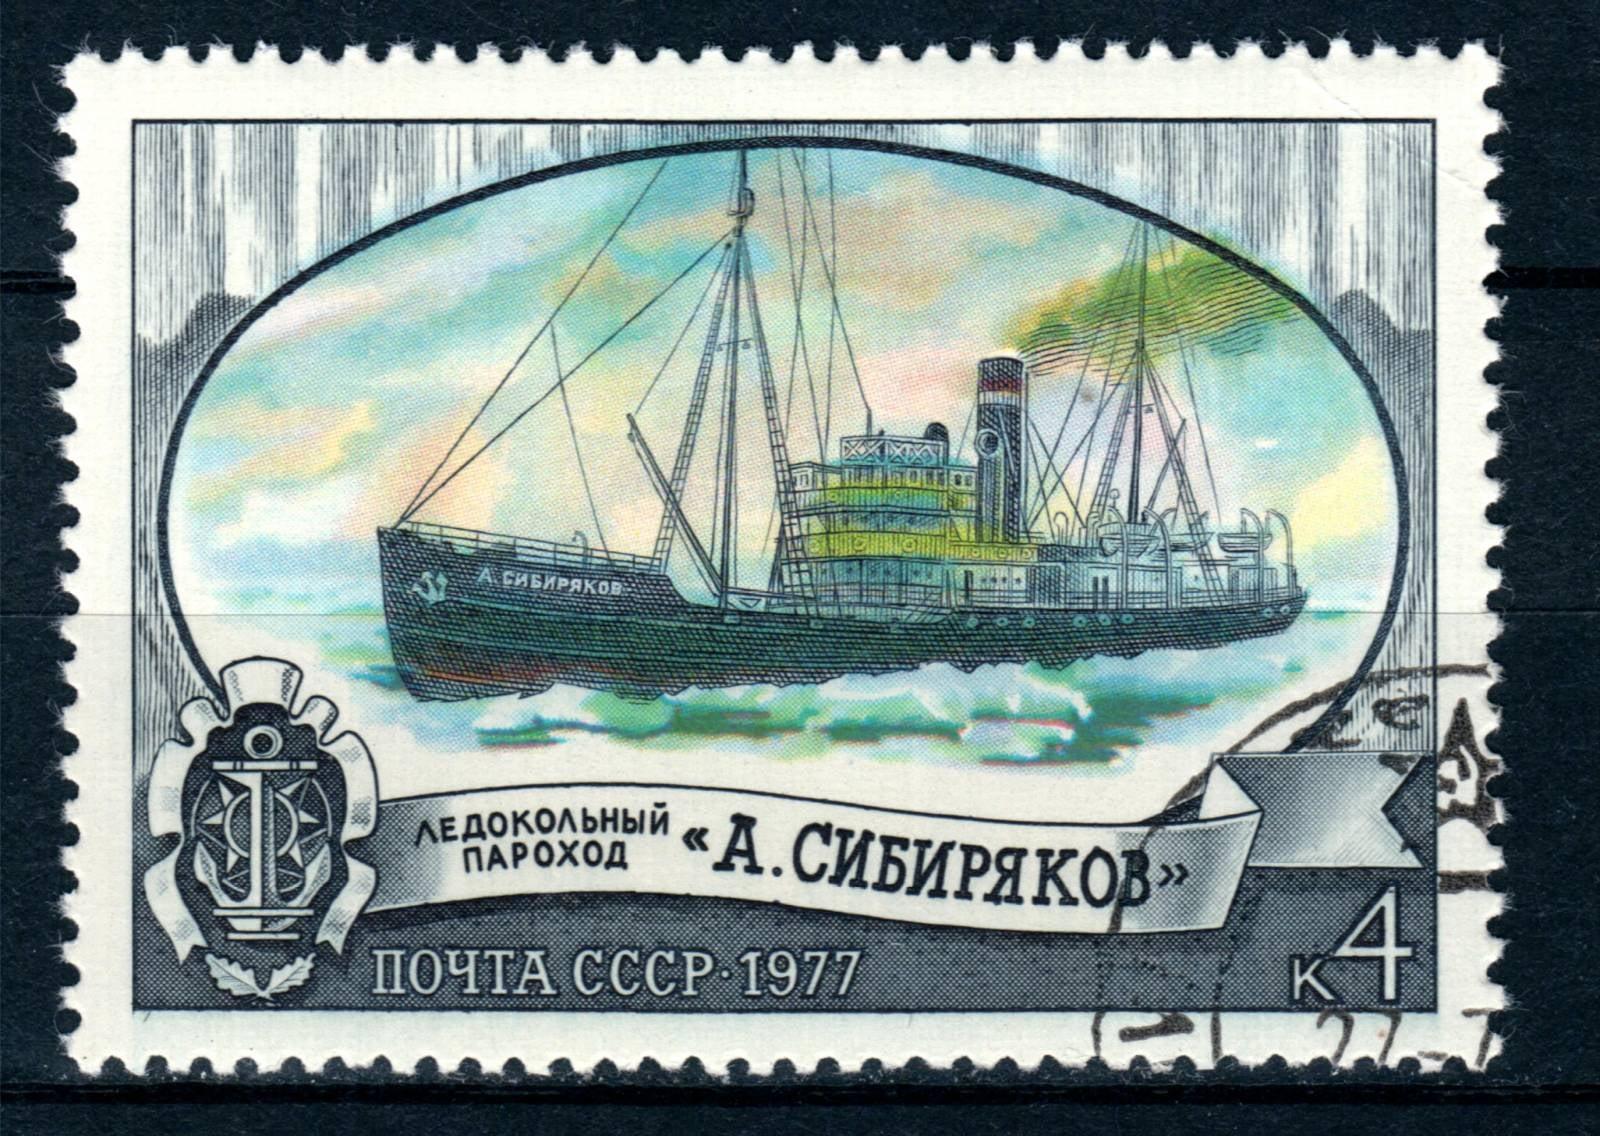 сибиряков